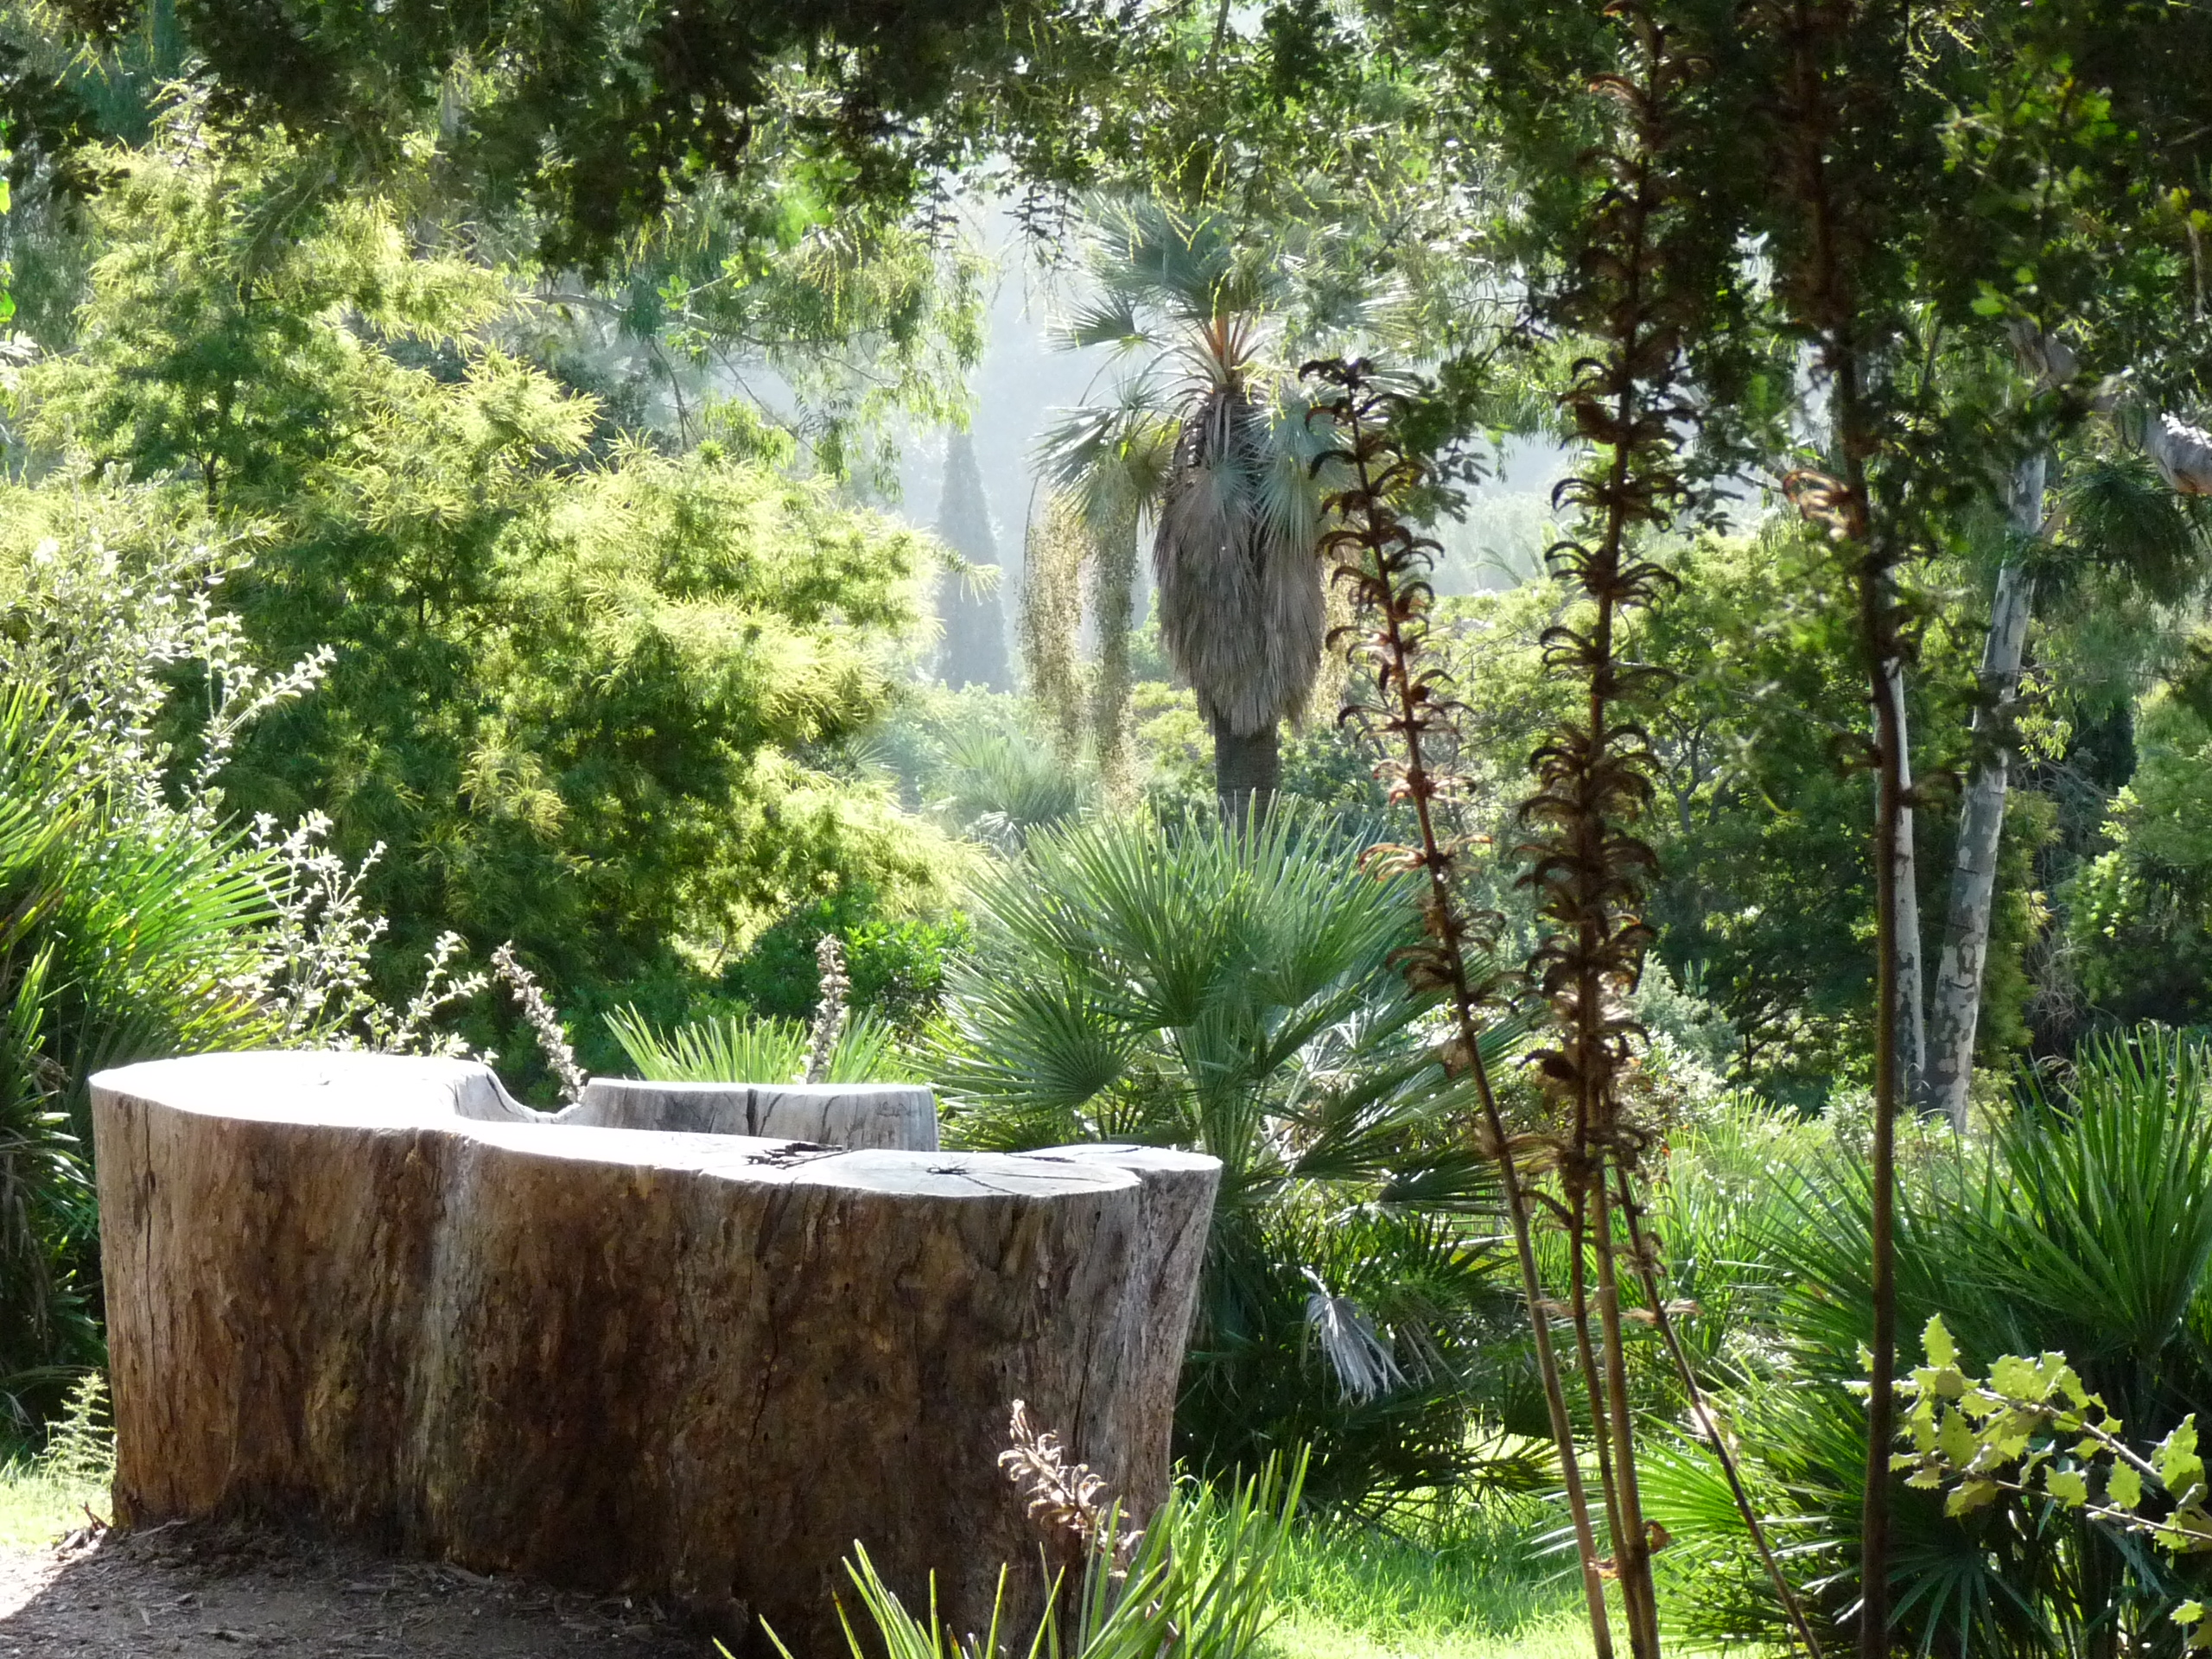 Jardin_d'Australie,_tronc_d'eucalyptus_-_Domaine_du_Rayol